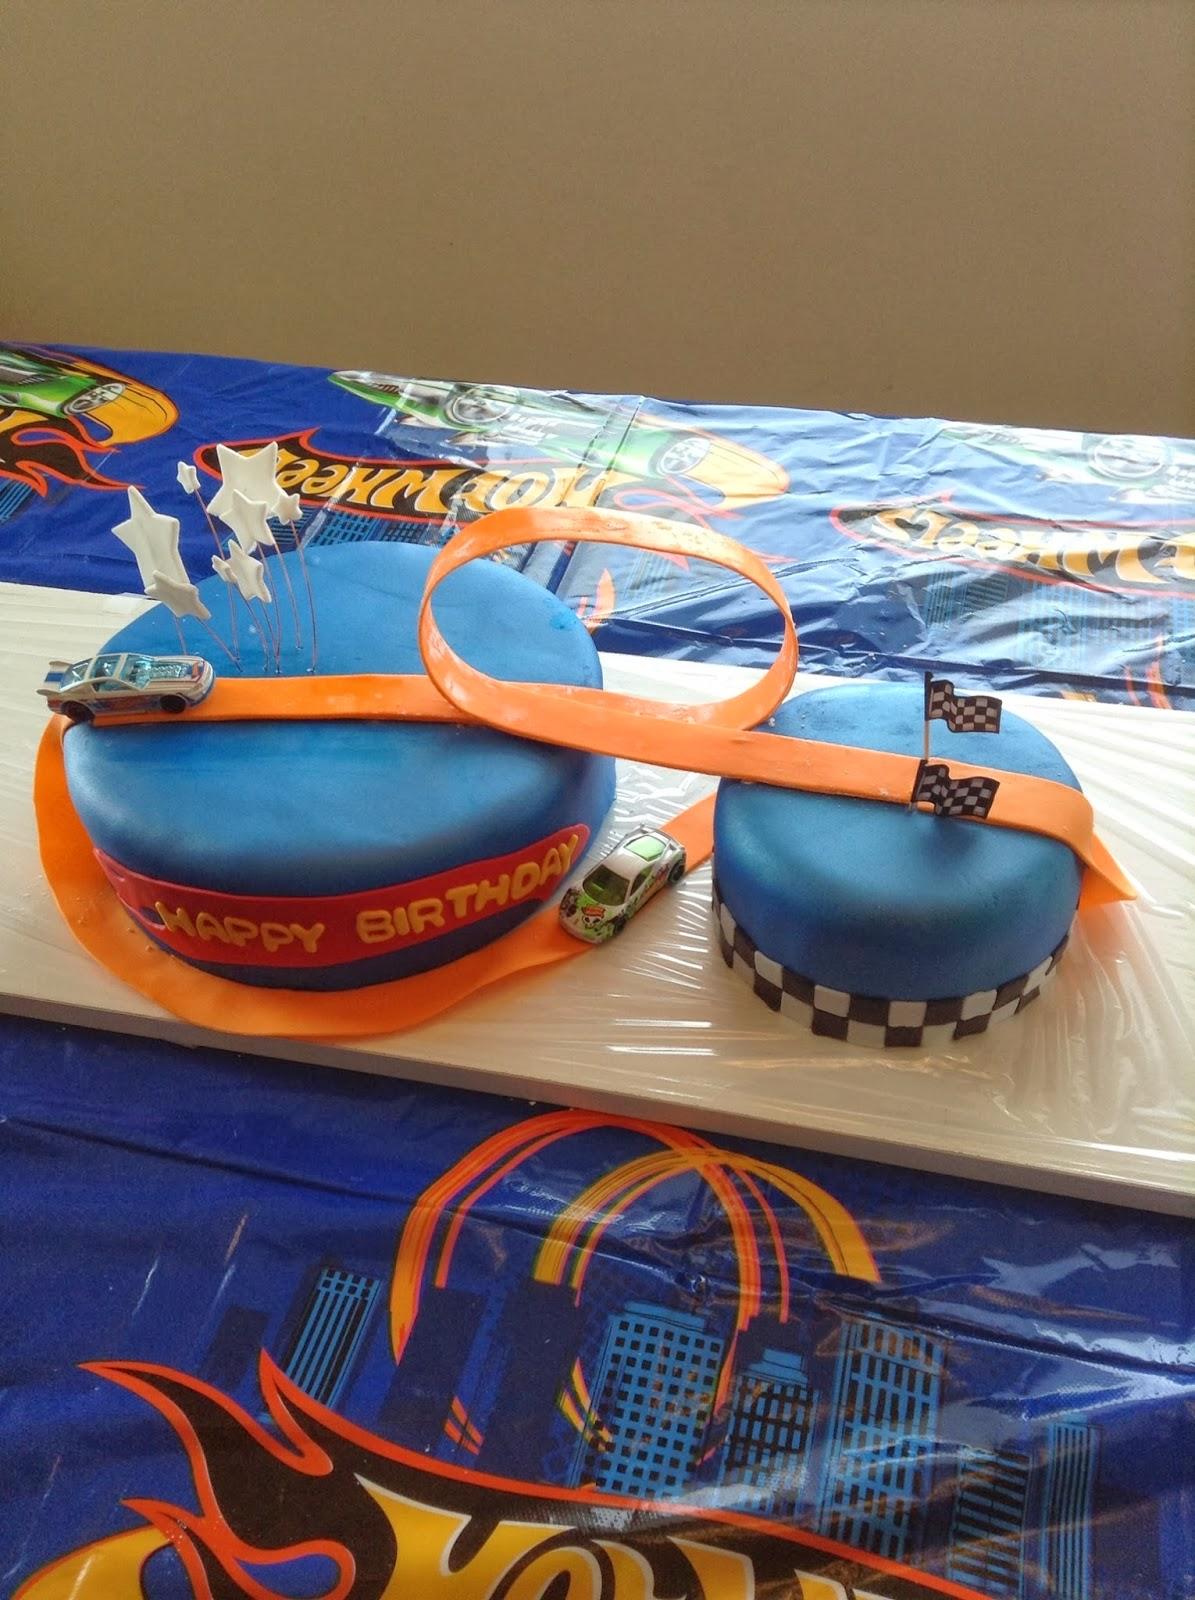 Pin torta hot wheels jmr tortas decoradas ajilbabcom for Decoracion de cuarto hot wheels